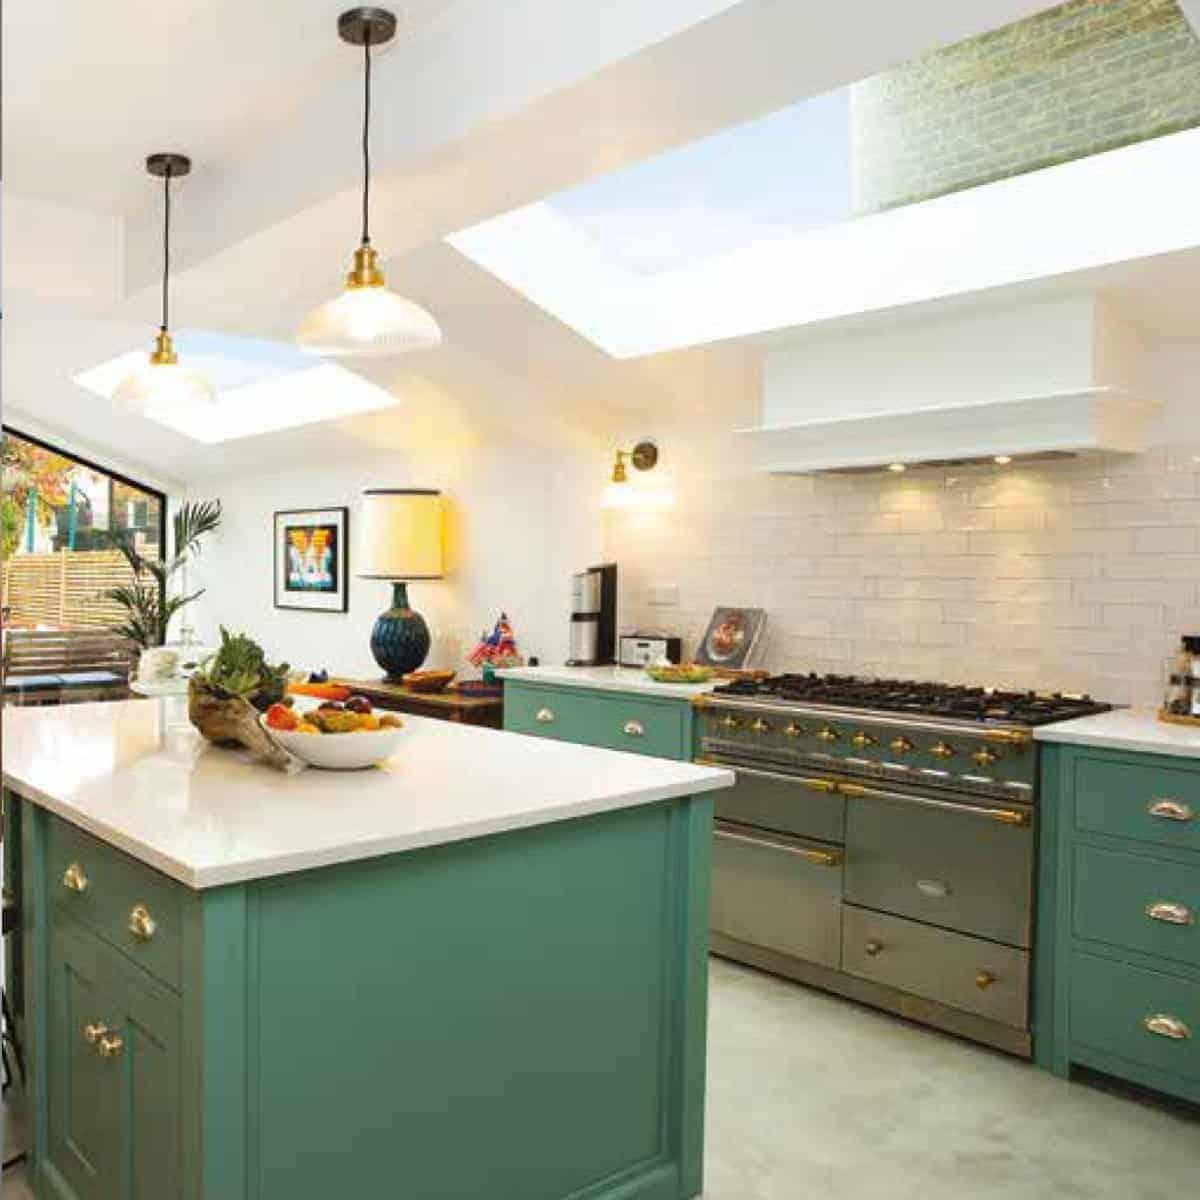 LA inspired kitchen interior